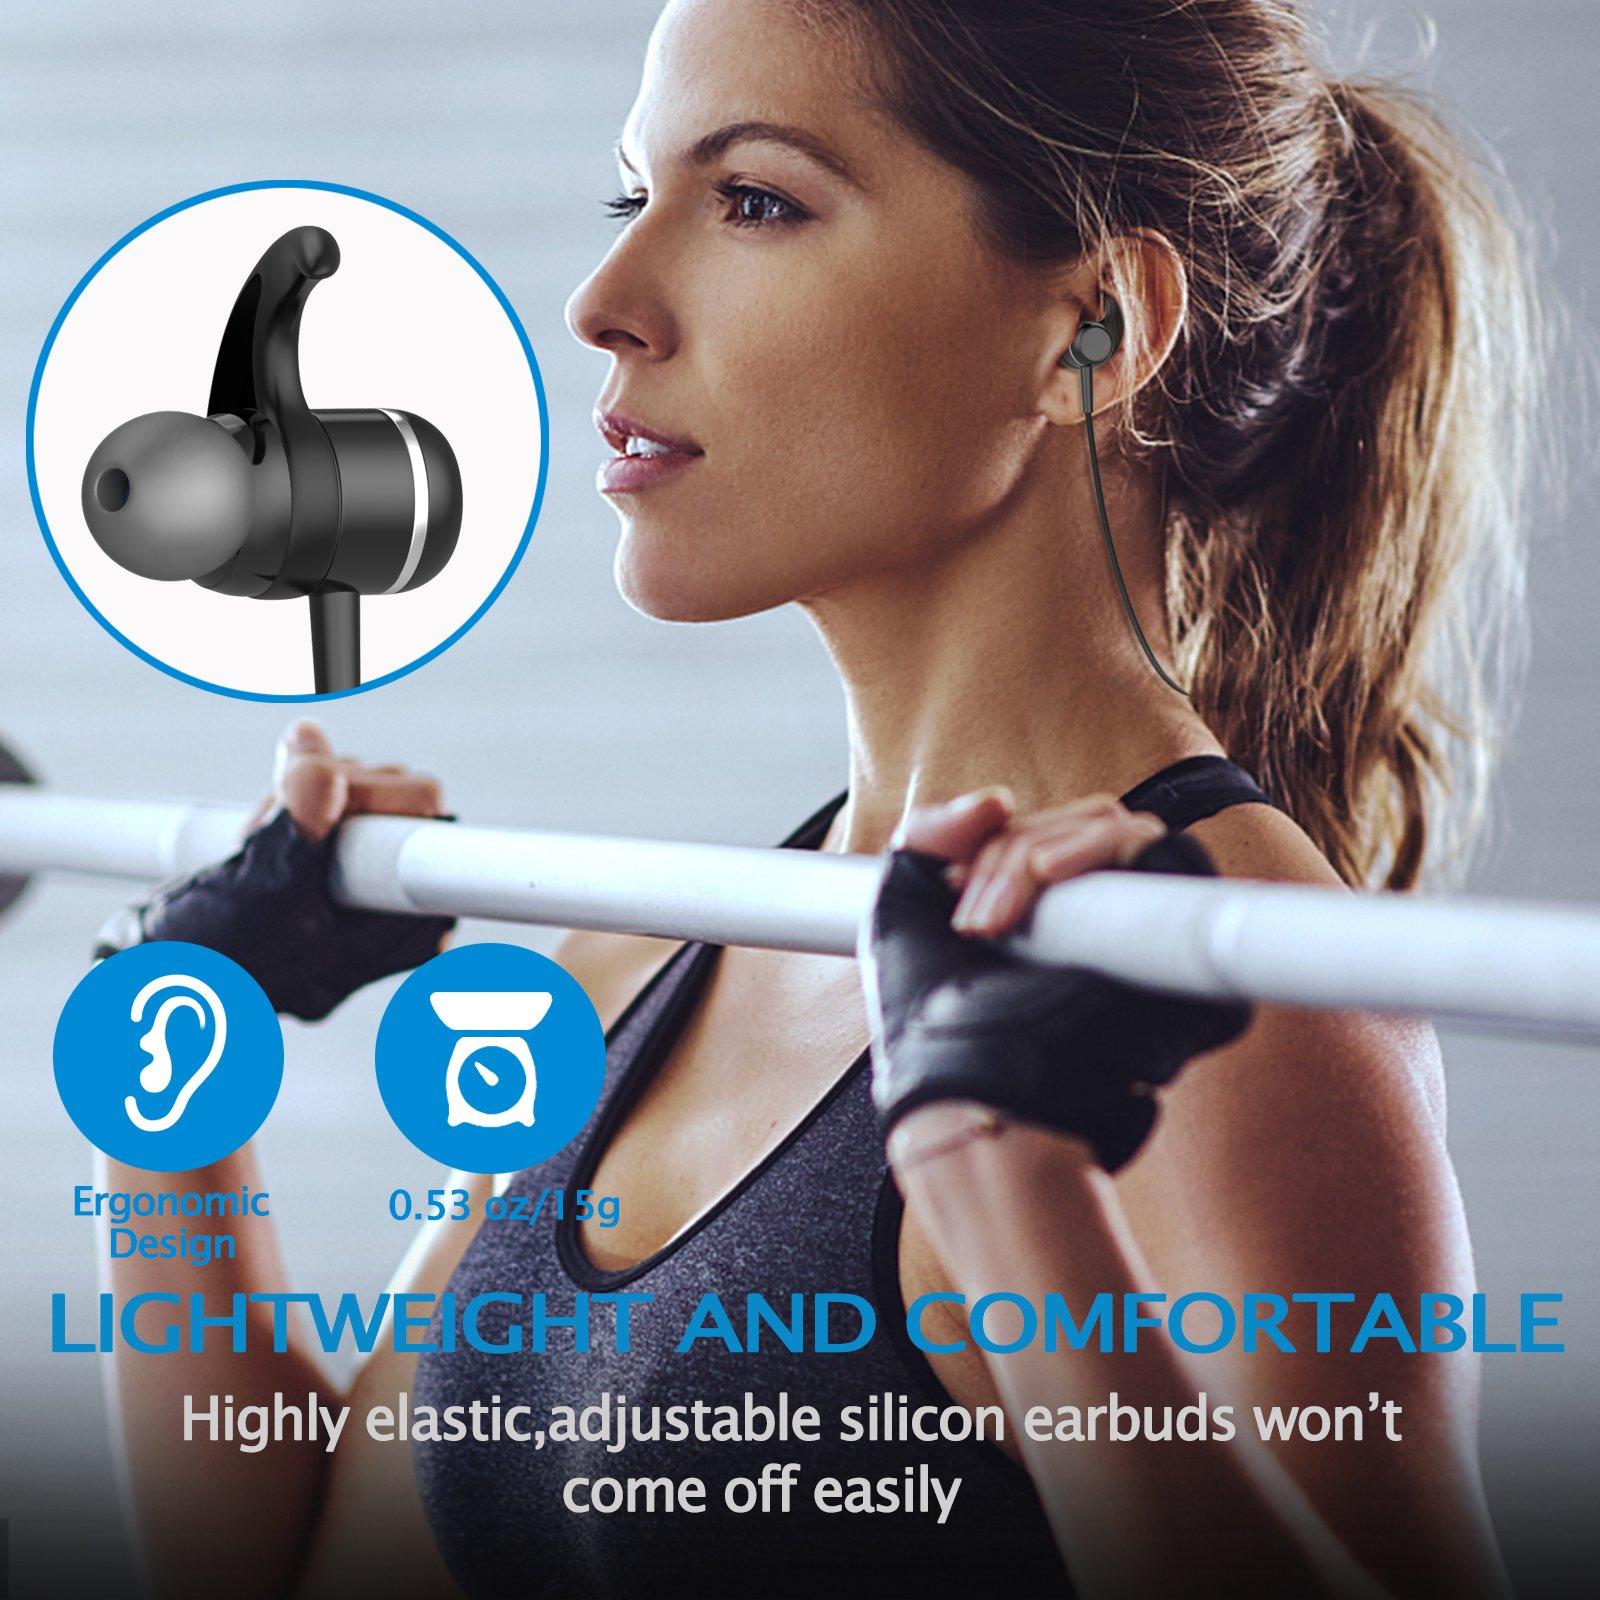 Bluetooth 4.1 Headphones, Sports Earphones w/Mic, Waterproof HD Stereo Earbuds for Gym Running by LIREION (Image #3)